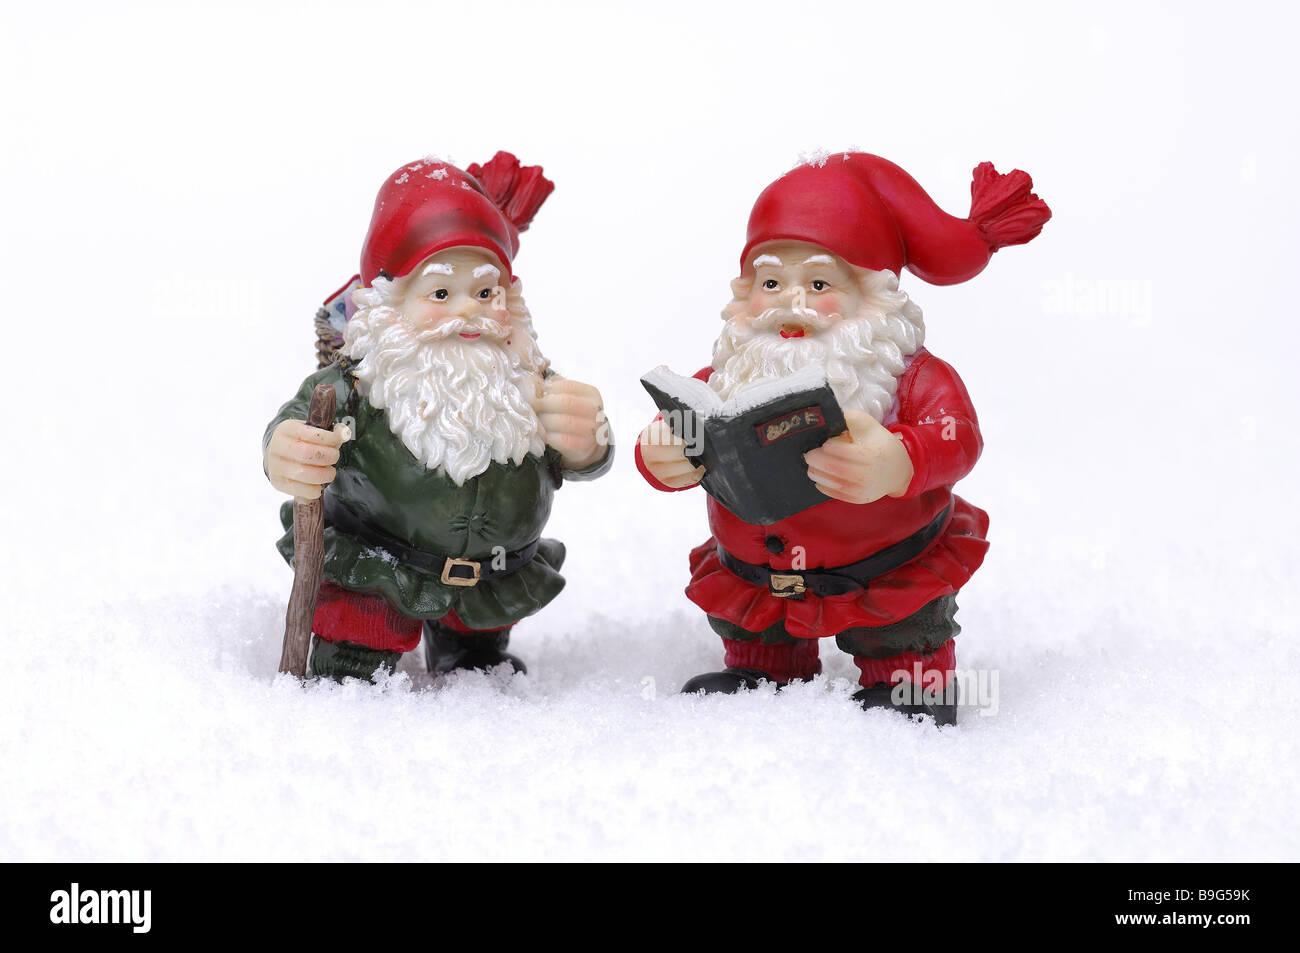 Artificial Snow Santa Claus Figures Two Christmas Decoration Decoration Objects Figures Santa Claus Decoration Christmas Kitsch